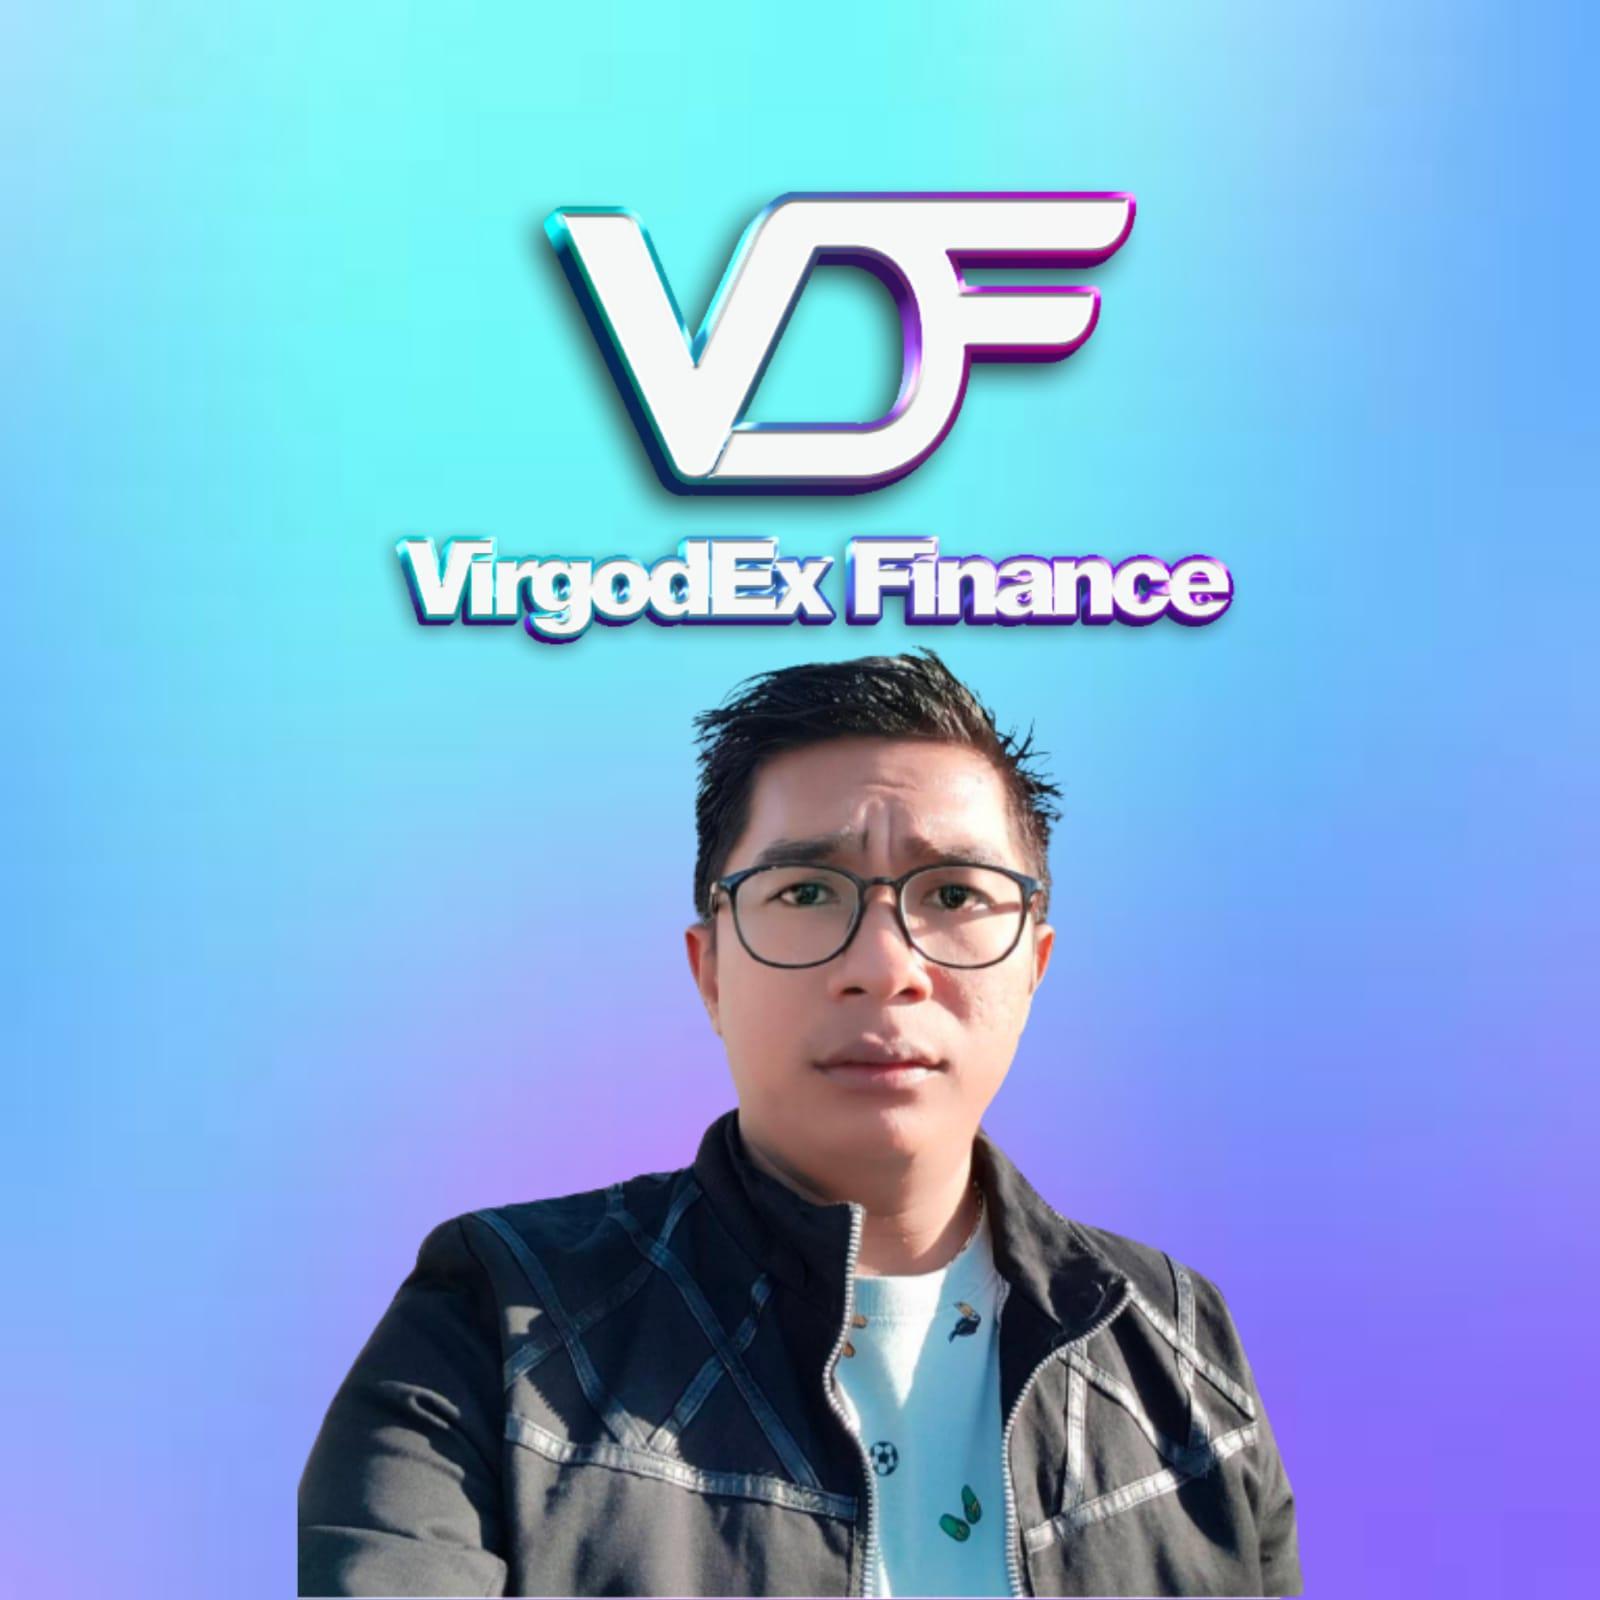 VirgodEx Finance ICO Charis Zunaedi